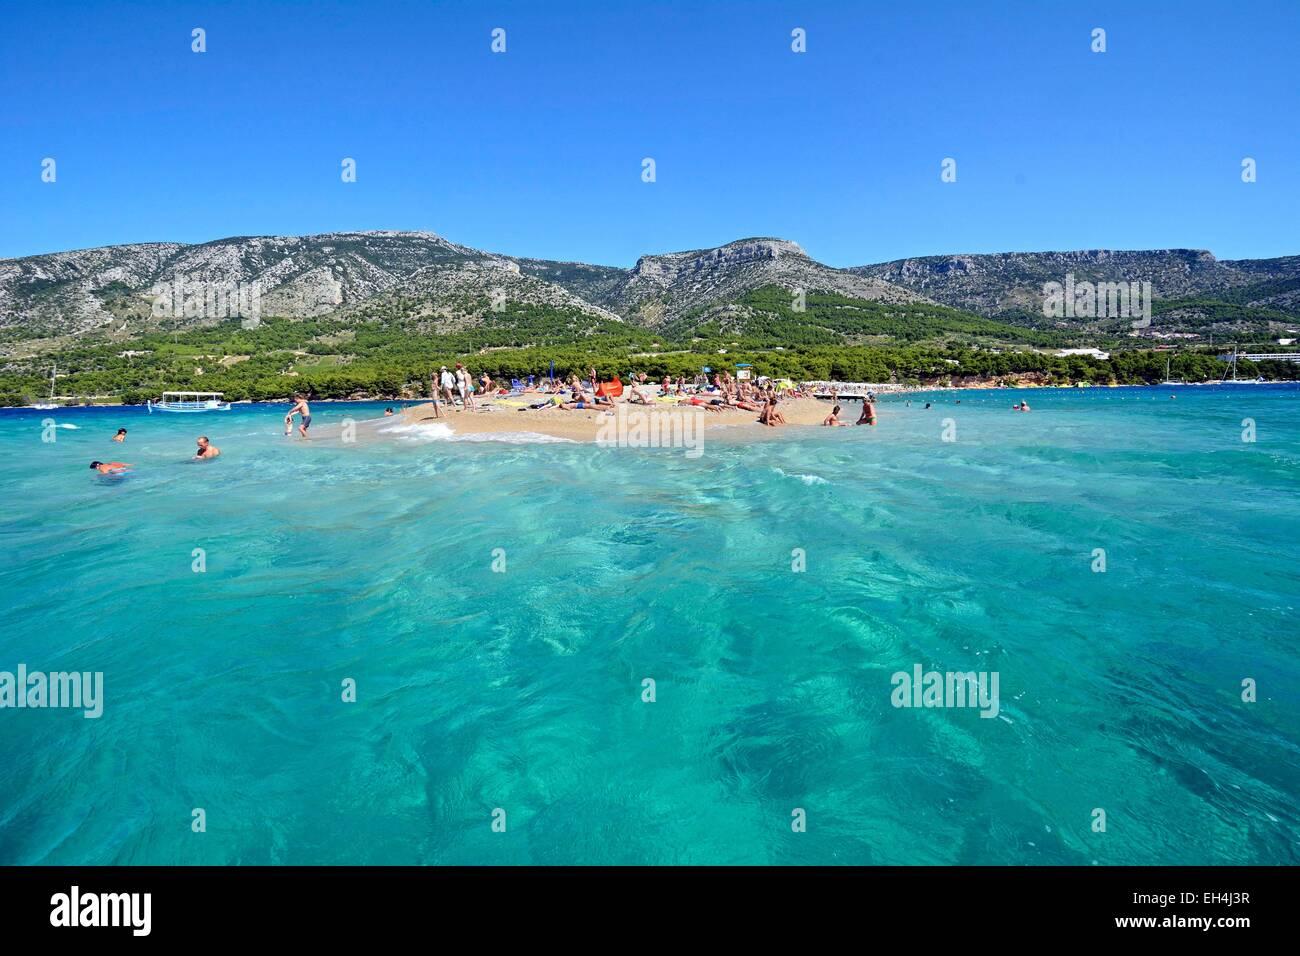 Croatia, Island Brac, beach Golden Horn popular with sunbathers in summer - Stock Image